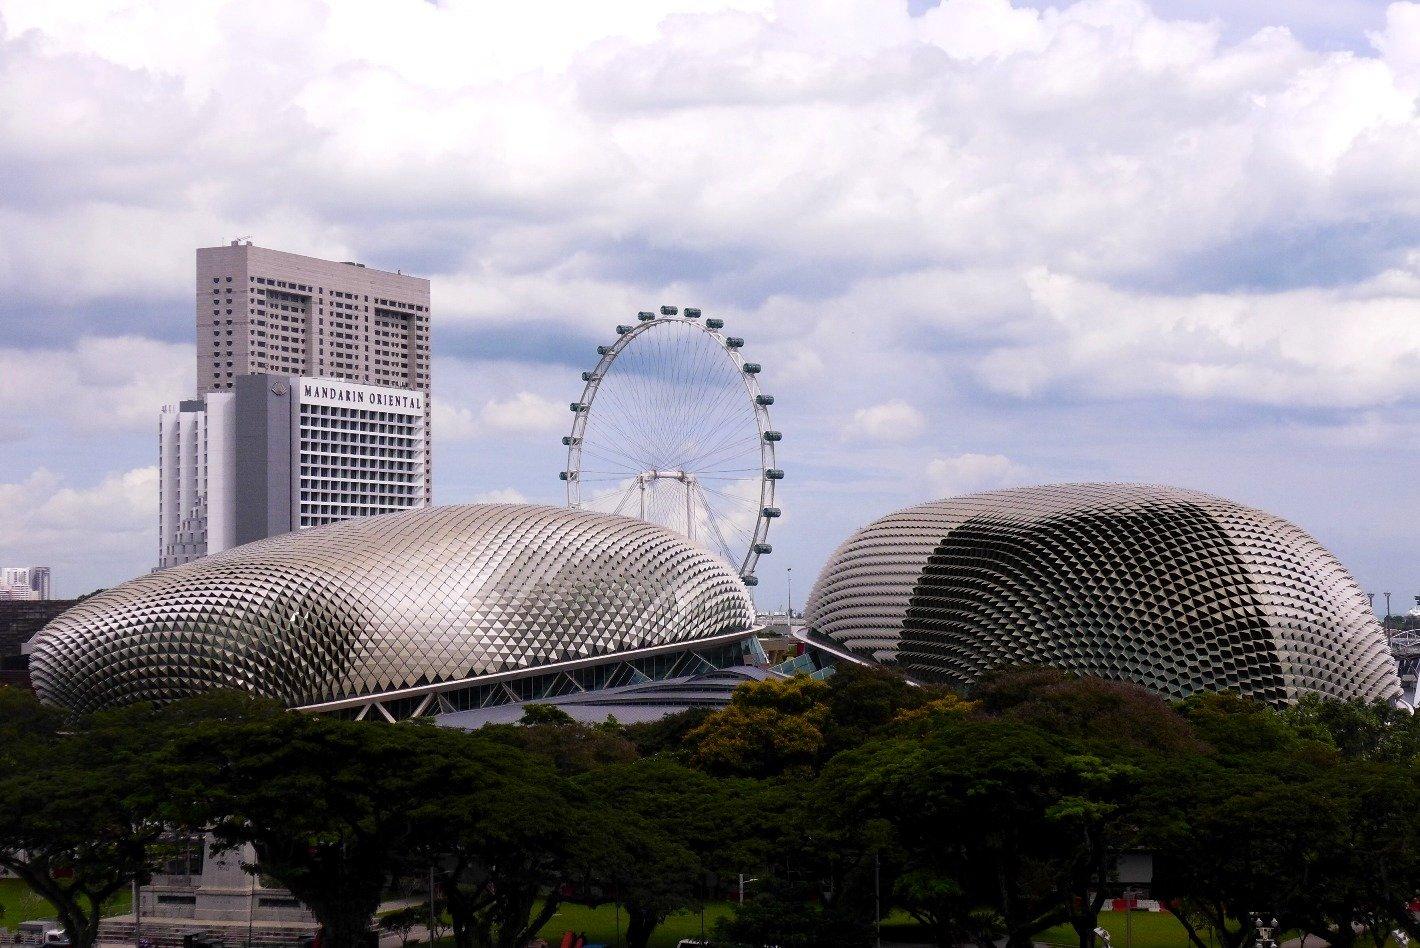 D.I.Y. Singapore Modern Buildings; D.I.Y. Singapore Itinerary; D.I.Y. Singapore Architecture Tour